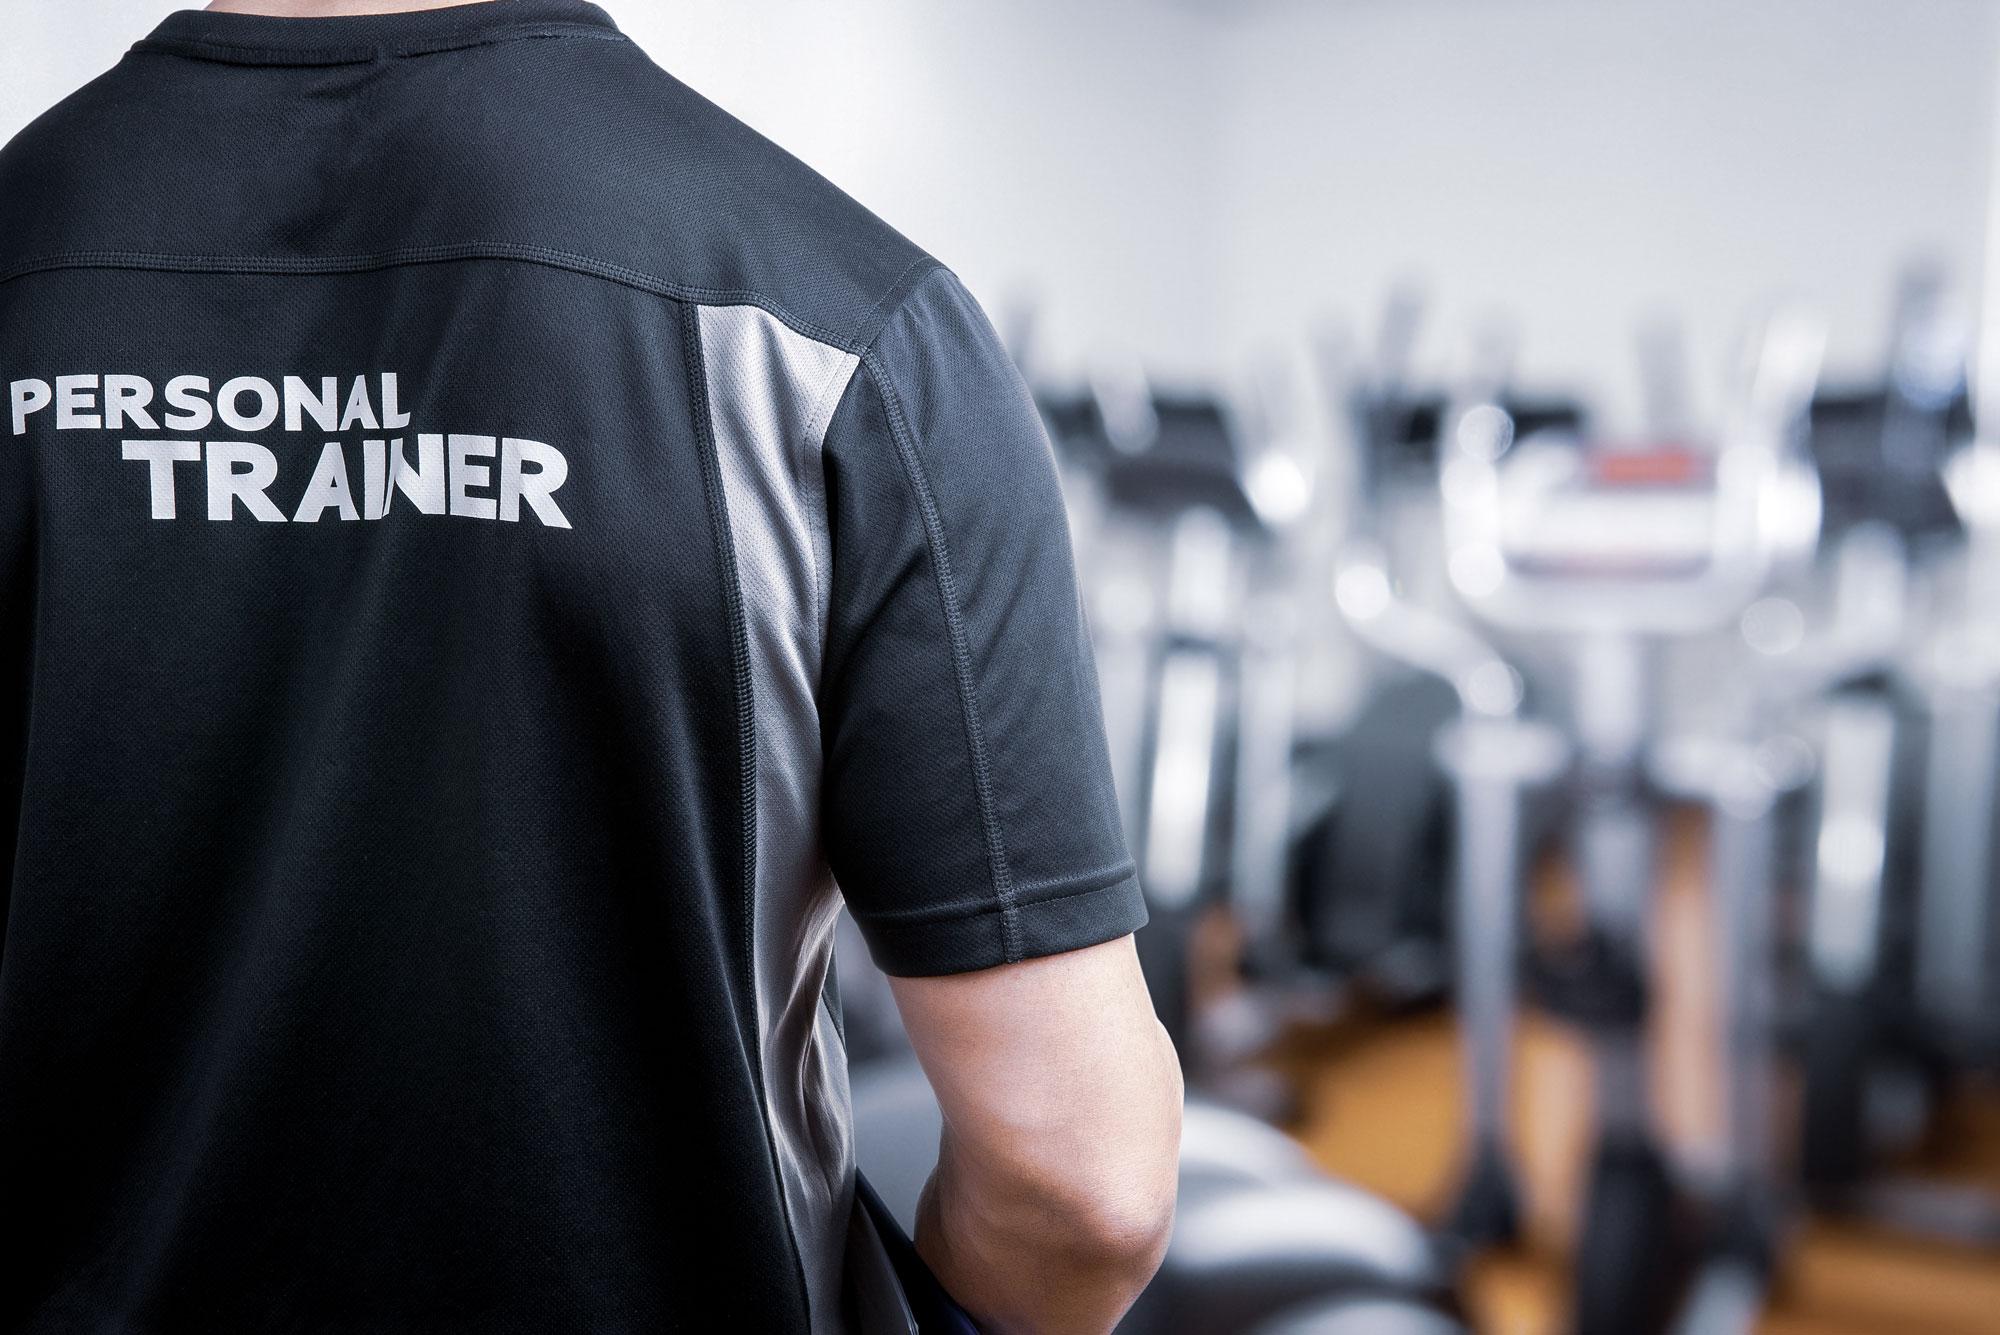 Servizi Extra: Personal trainer